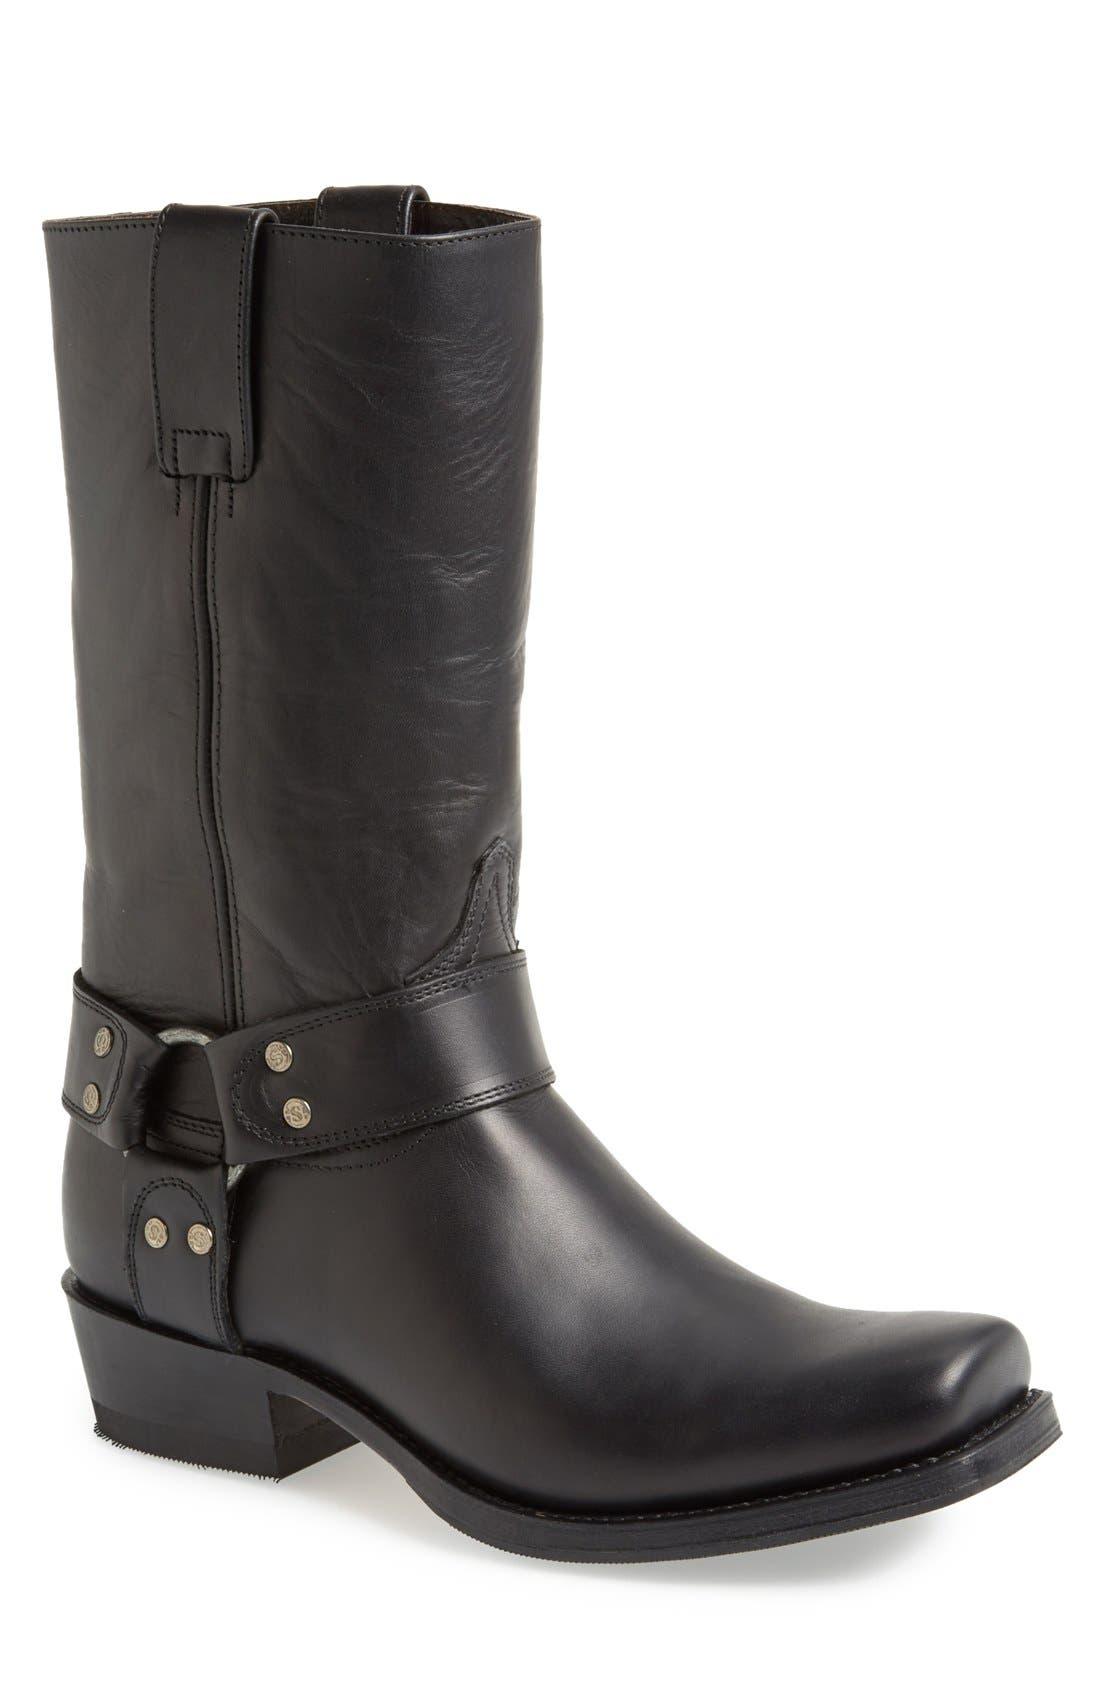 Boots Tall Harness Boot,                             Main thumbnail 1, color,                             BLACK